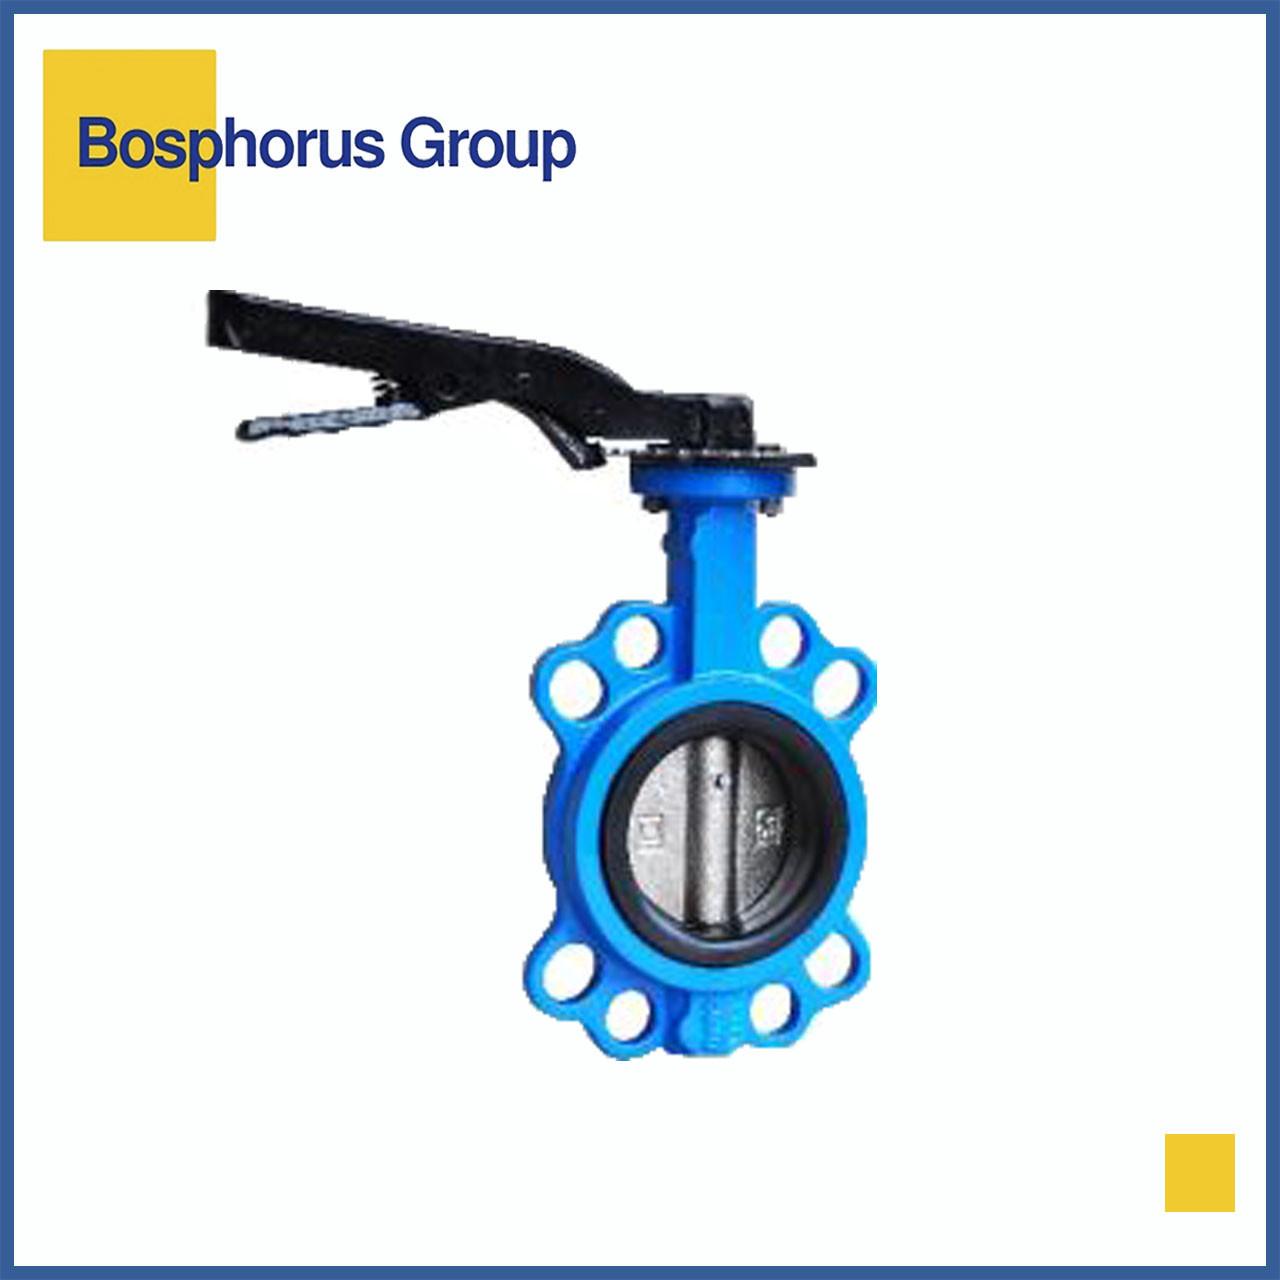 Затвор дисковый межфланцевый Ду150 Ру16, Brandoni (вода, +120)